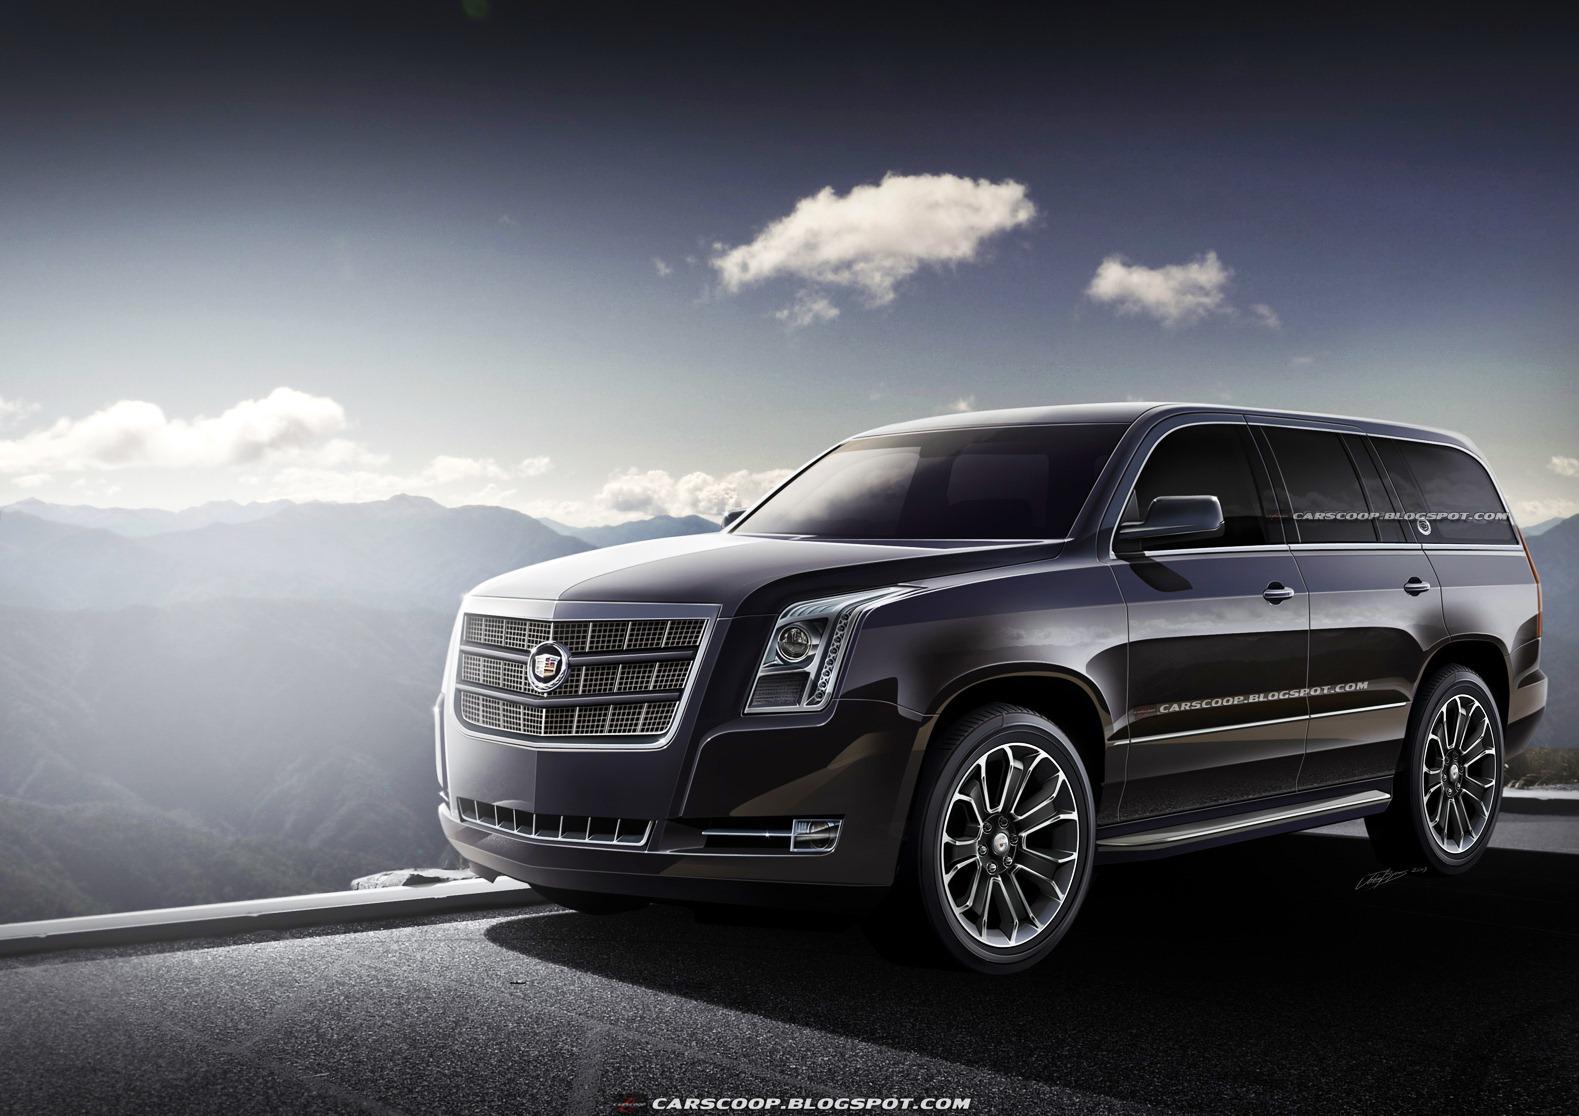 Cadillac Sedan 2014 foto - 3